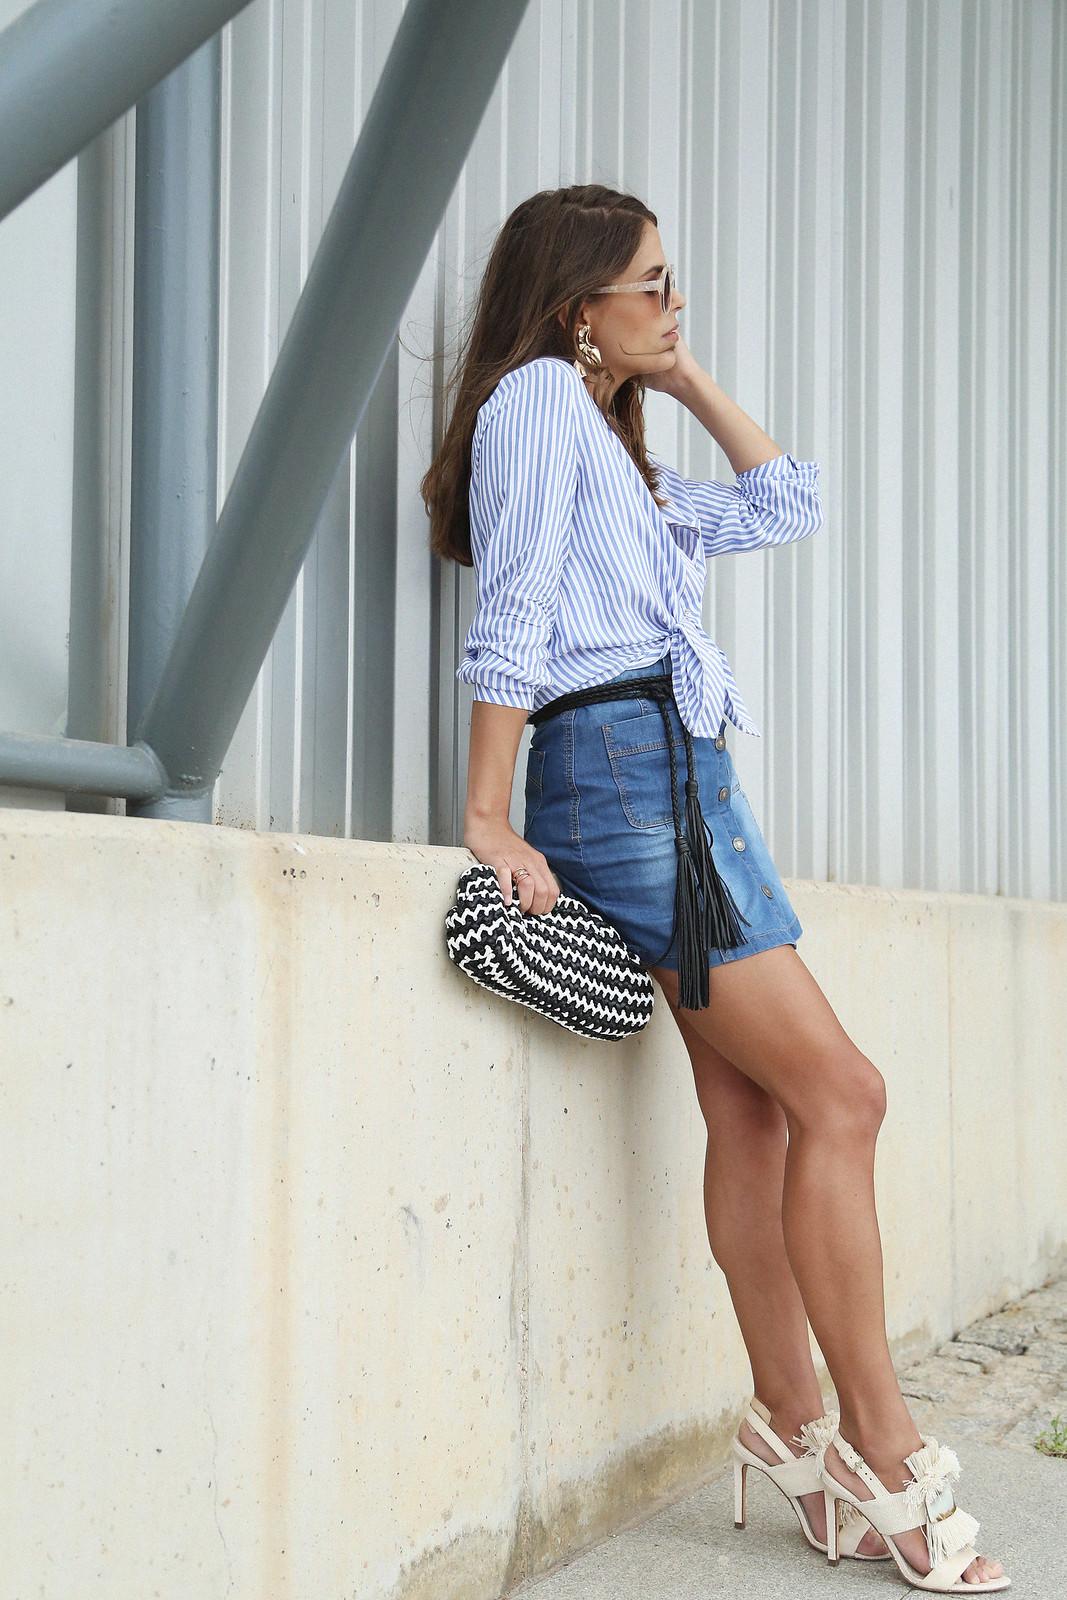 jessie chanes seams for a desire denim skirt stripes shirt-9